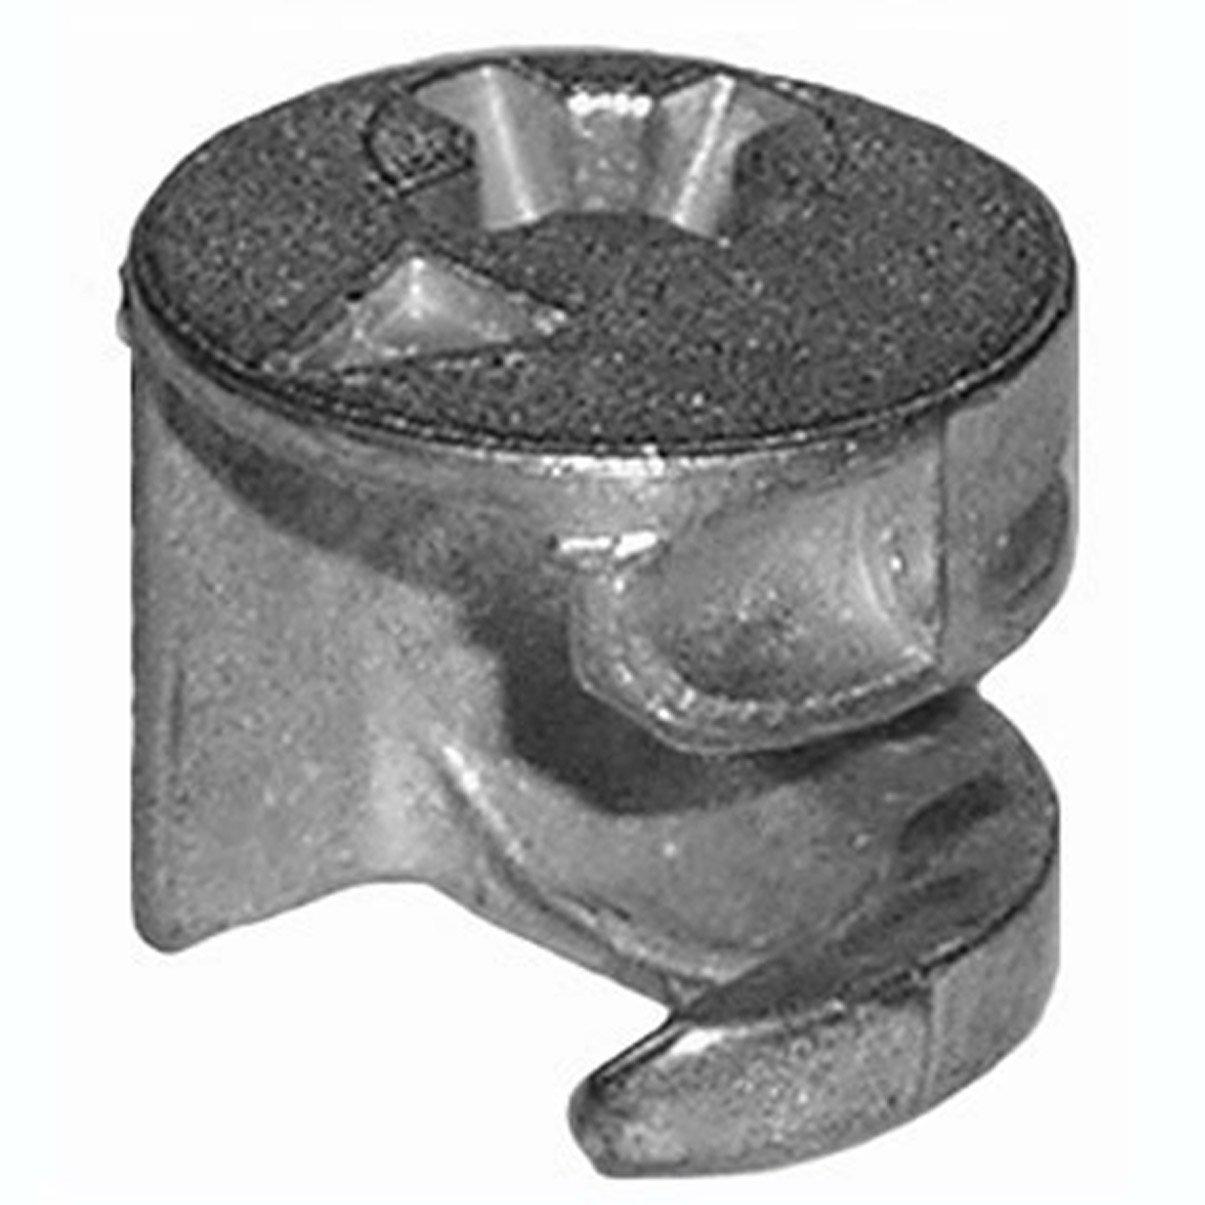 12mm x 10.5mm Cam Lock Nut Furniture Connector Fastener (10 Pack)